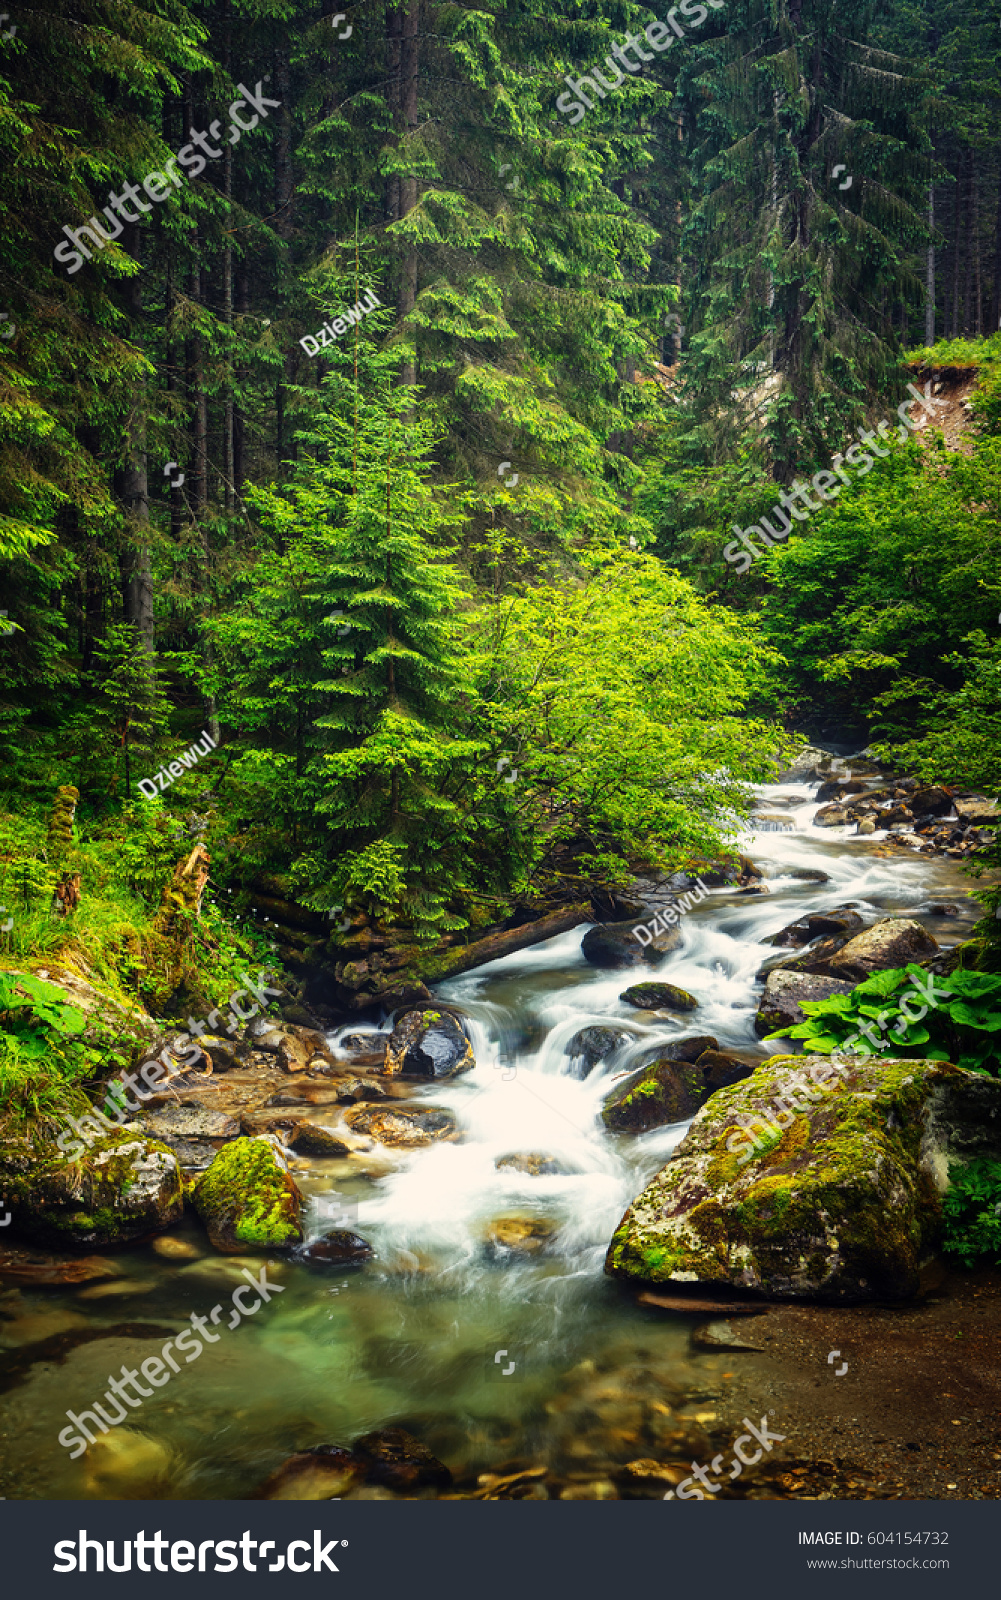 Nature Ireland S Wild River Nature Ireland S Wild River